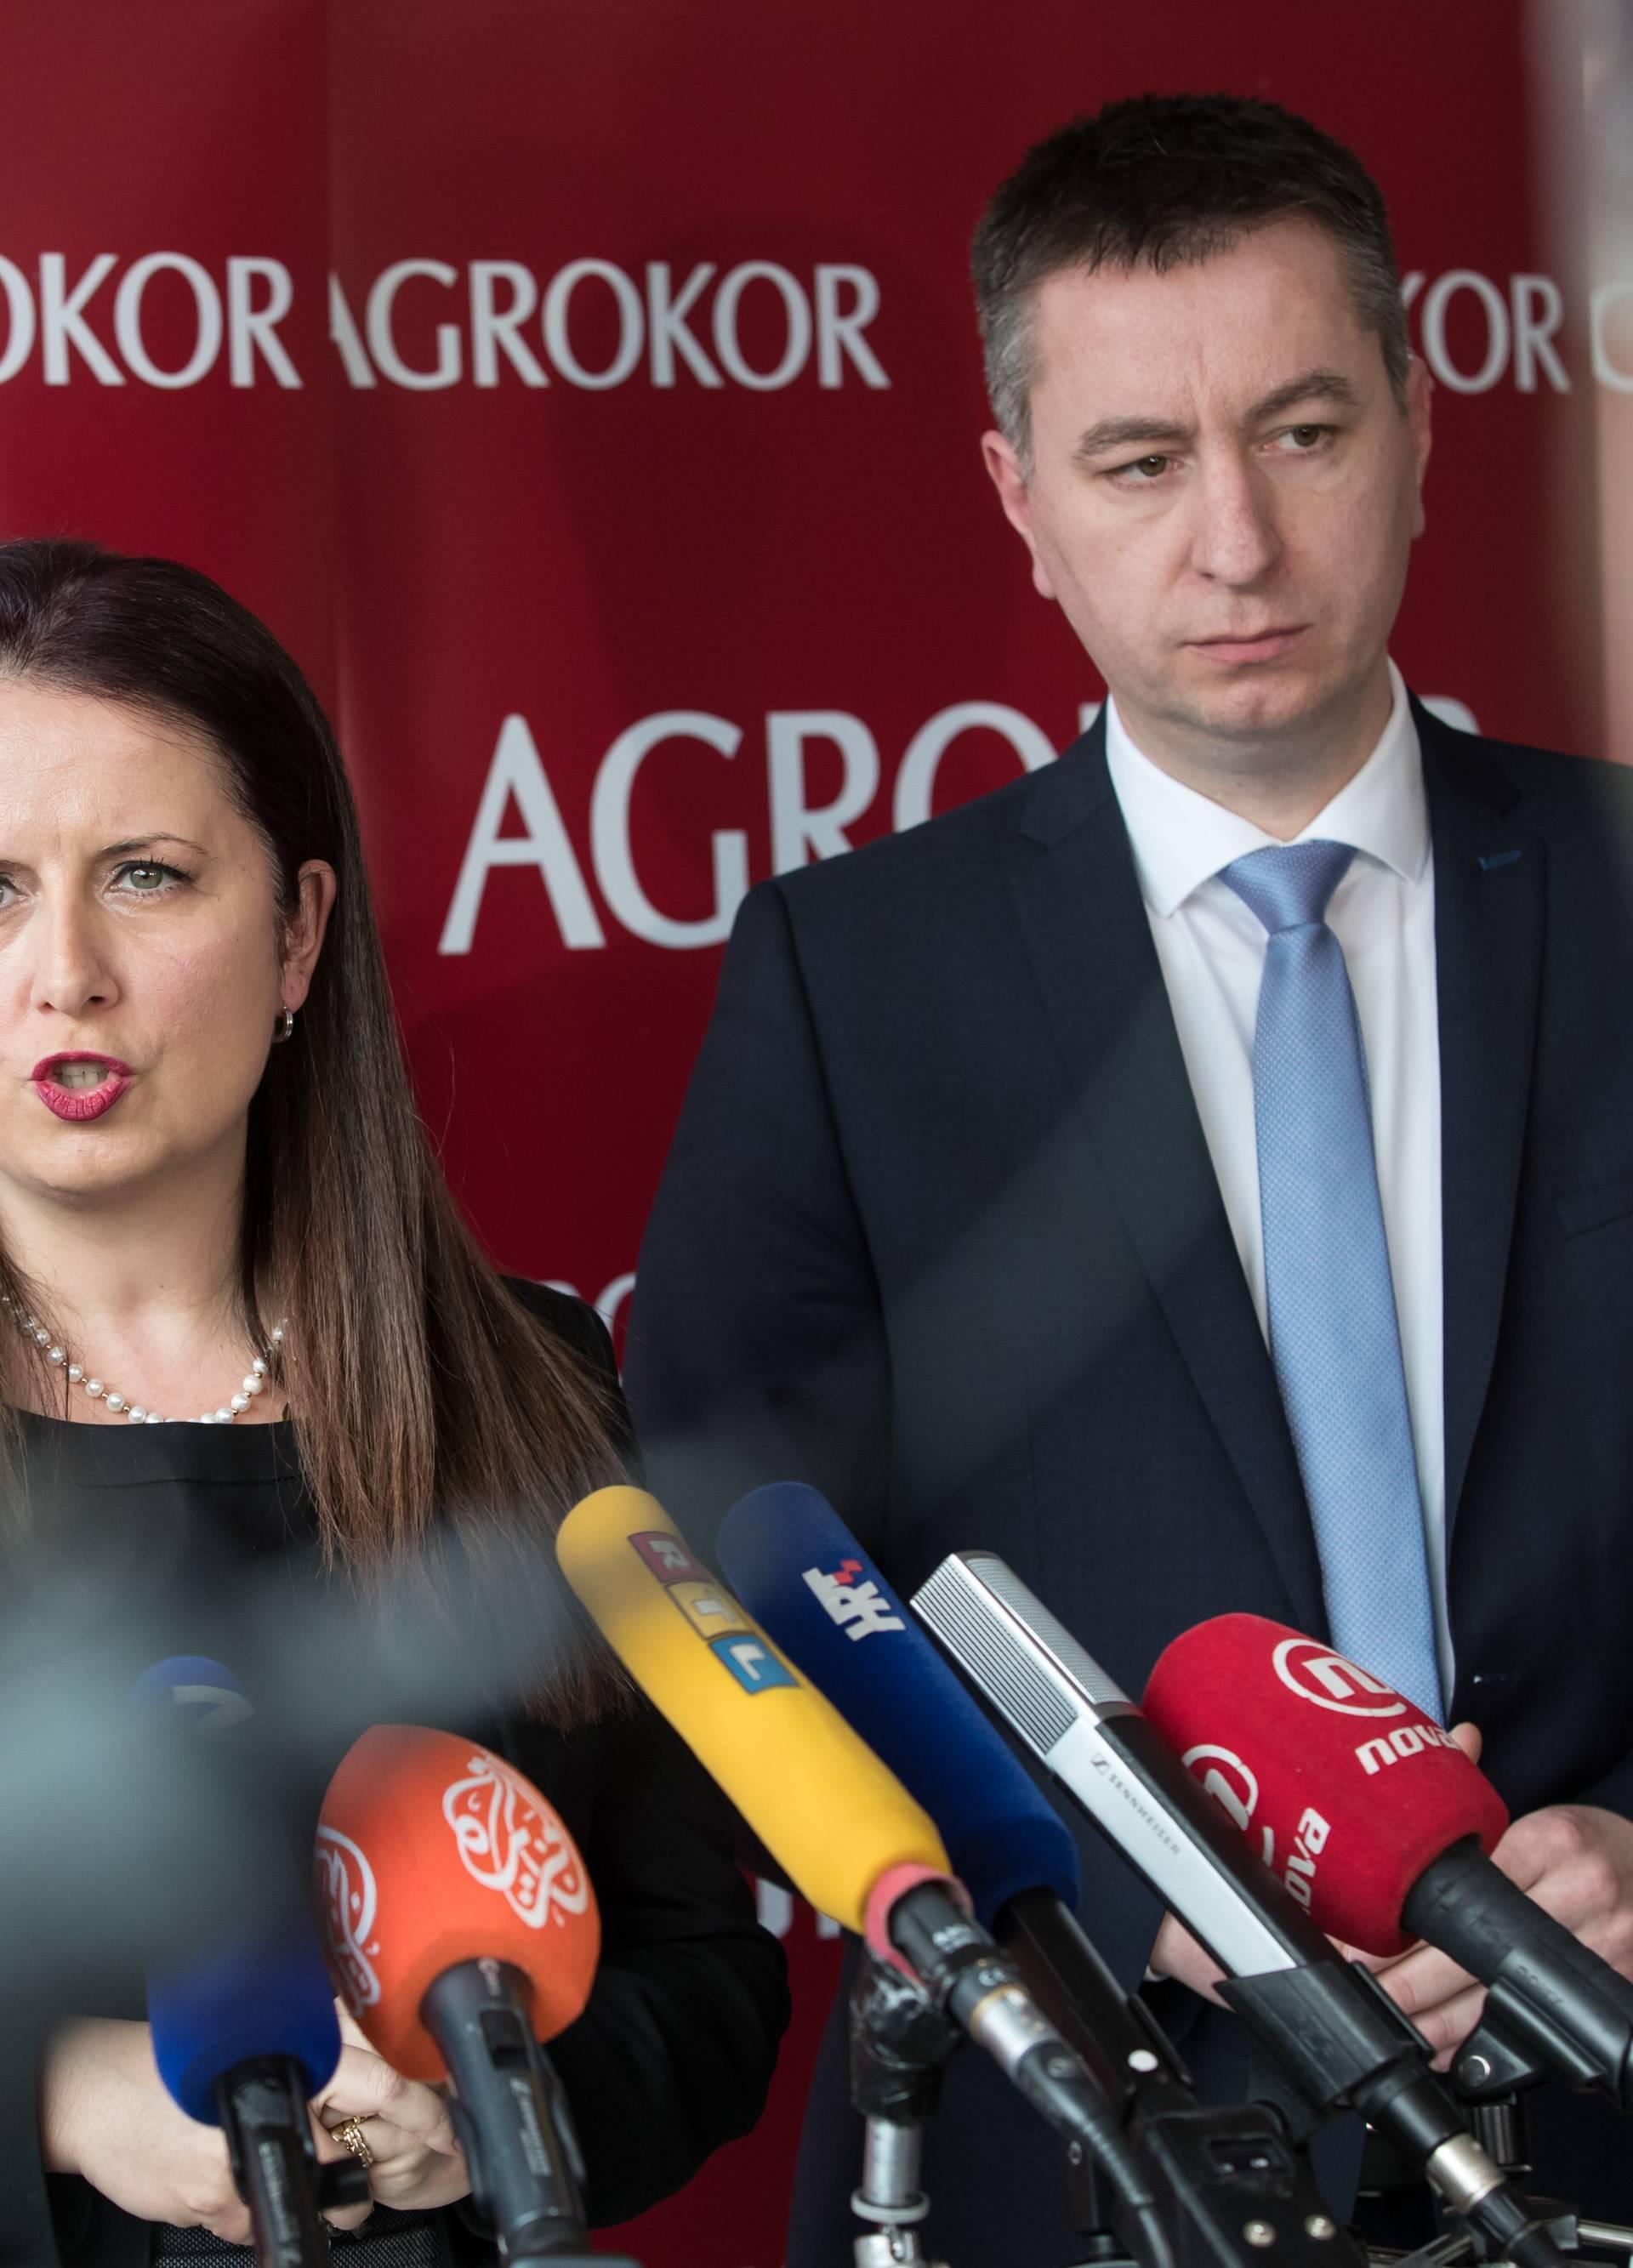 Slučaj Agrokor: Franck podnio podnesak Trgovačkom sudu